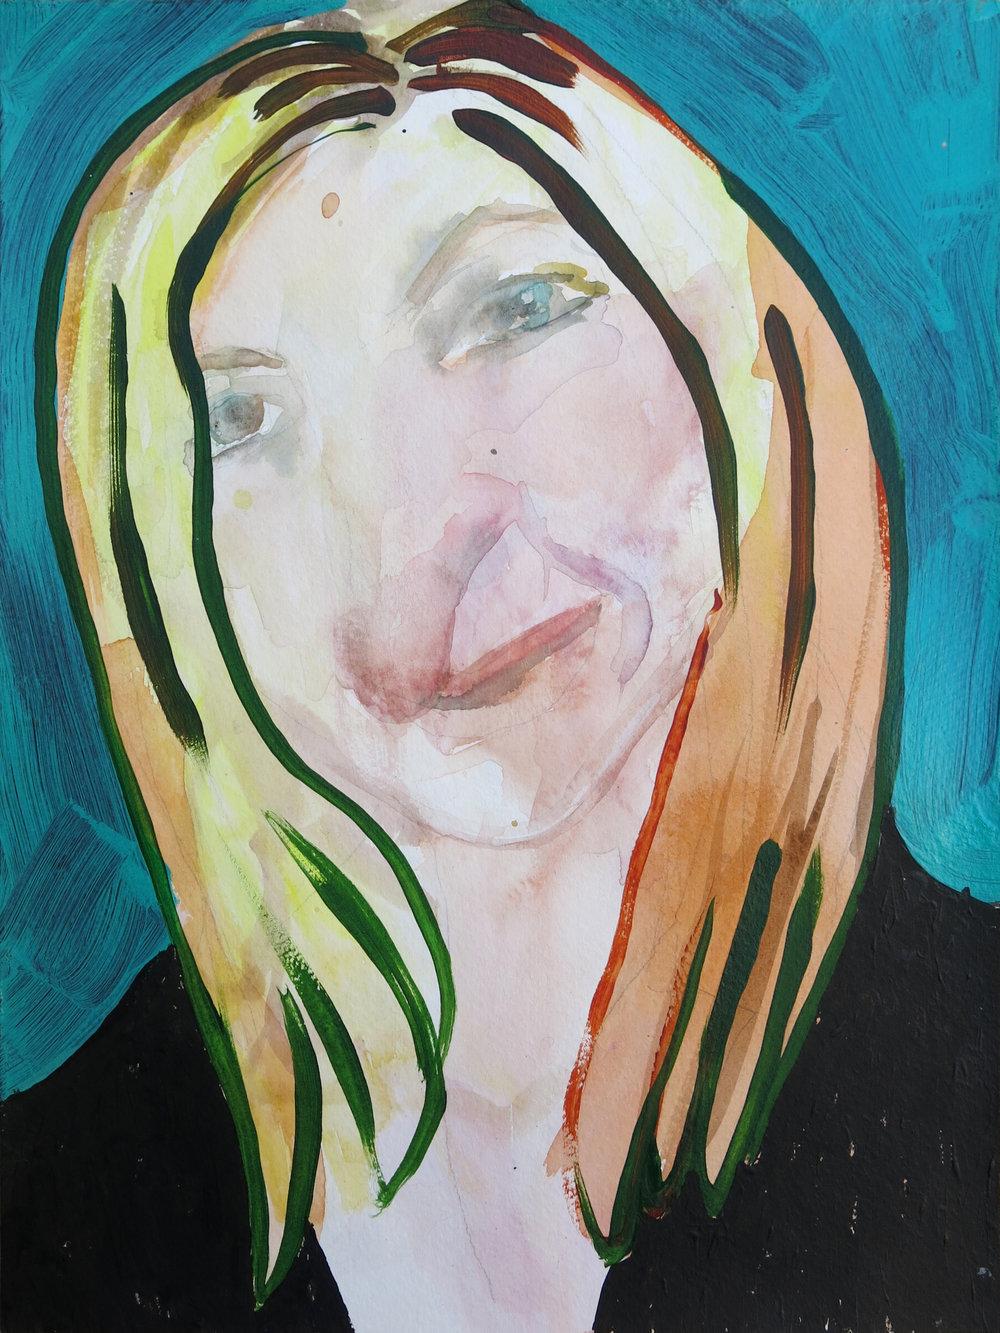 Barbra Streisand Portrait #142